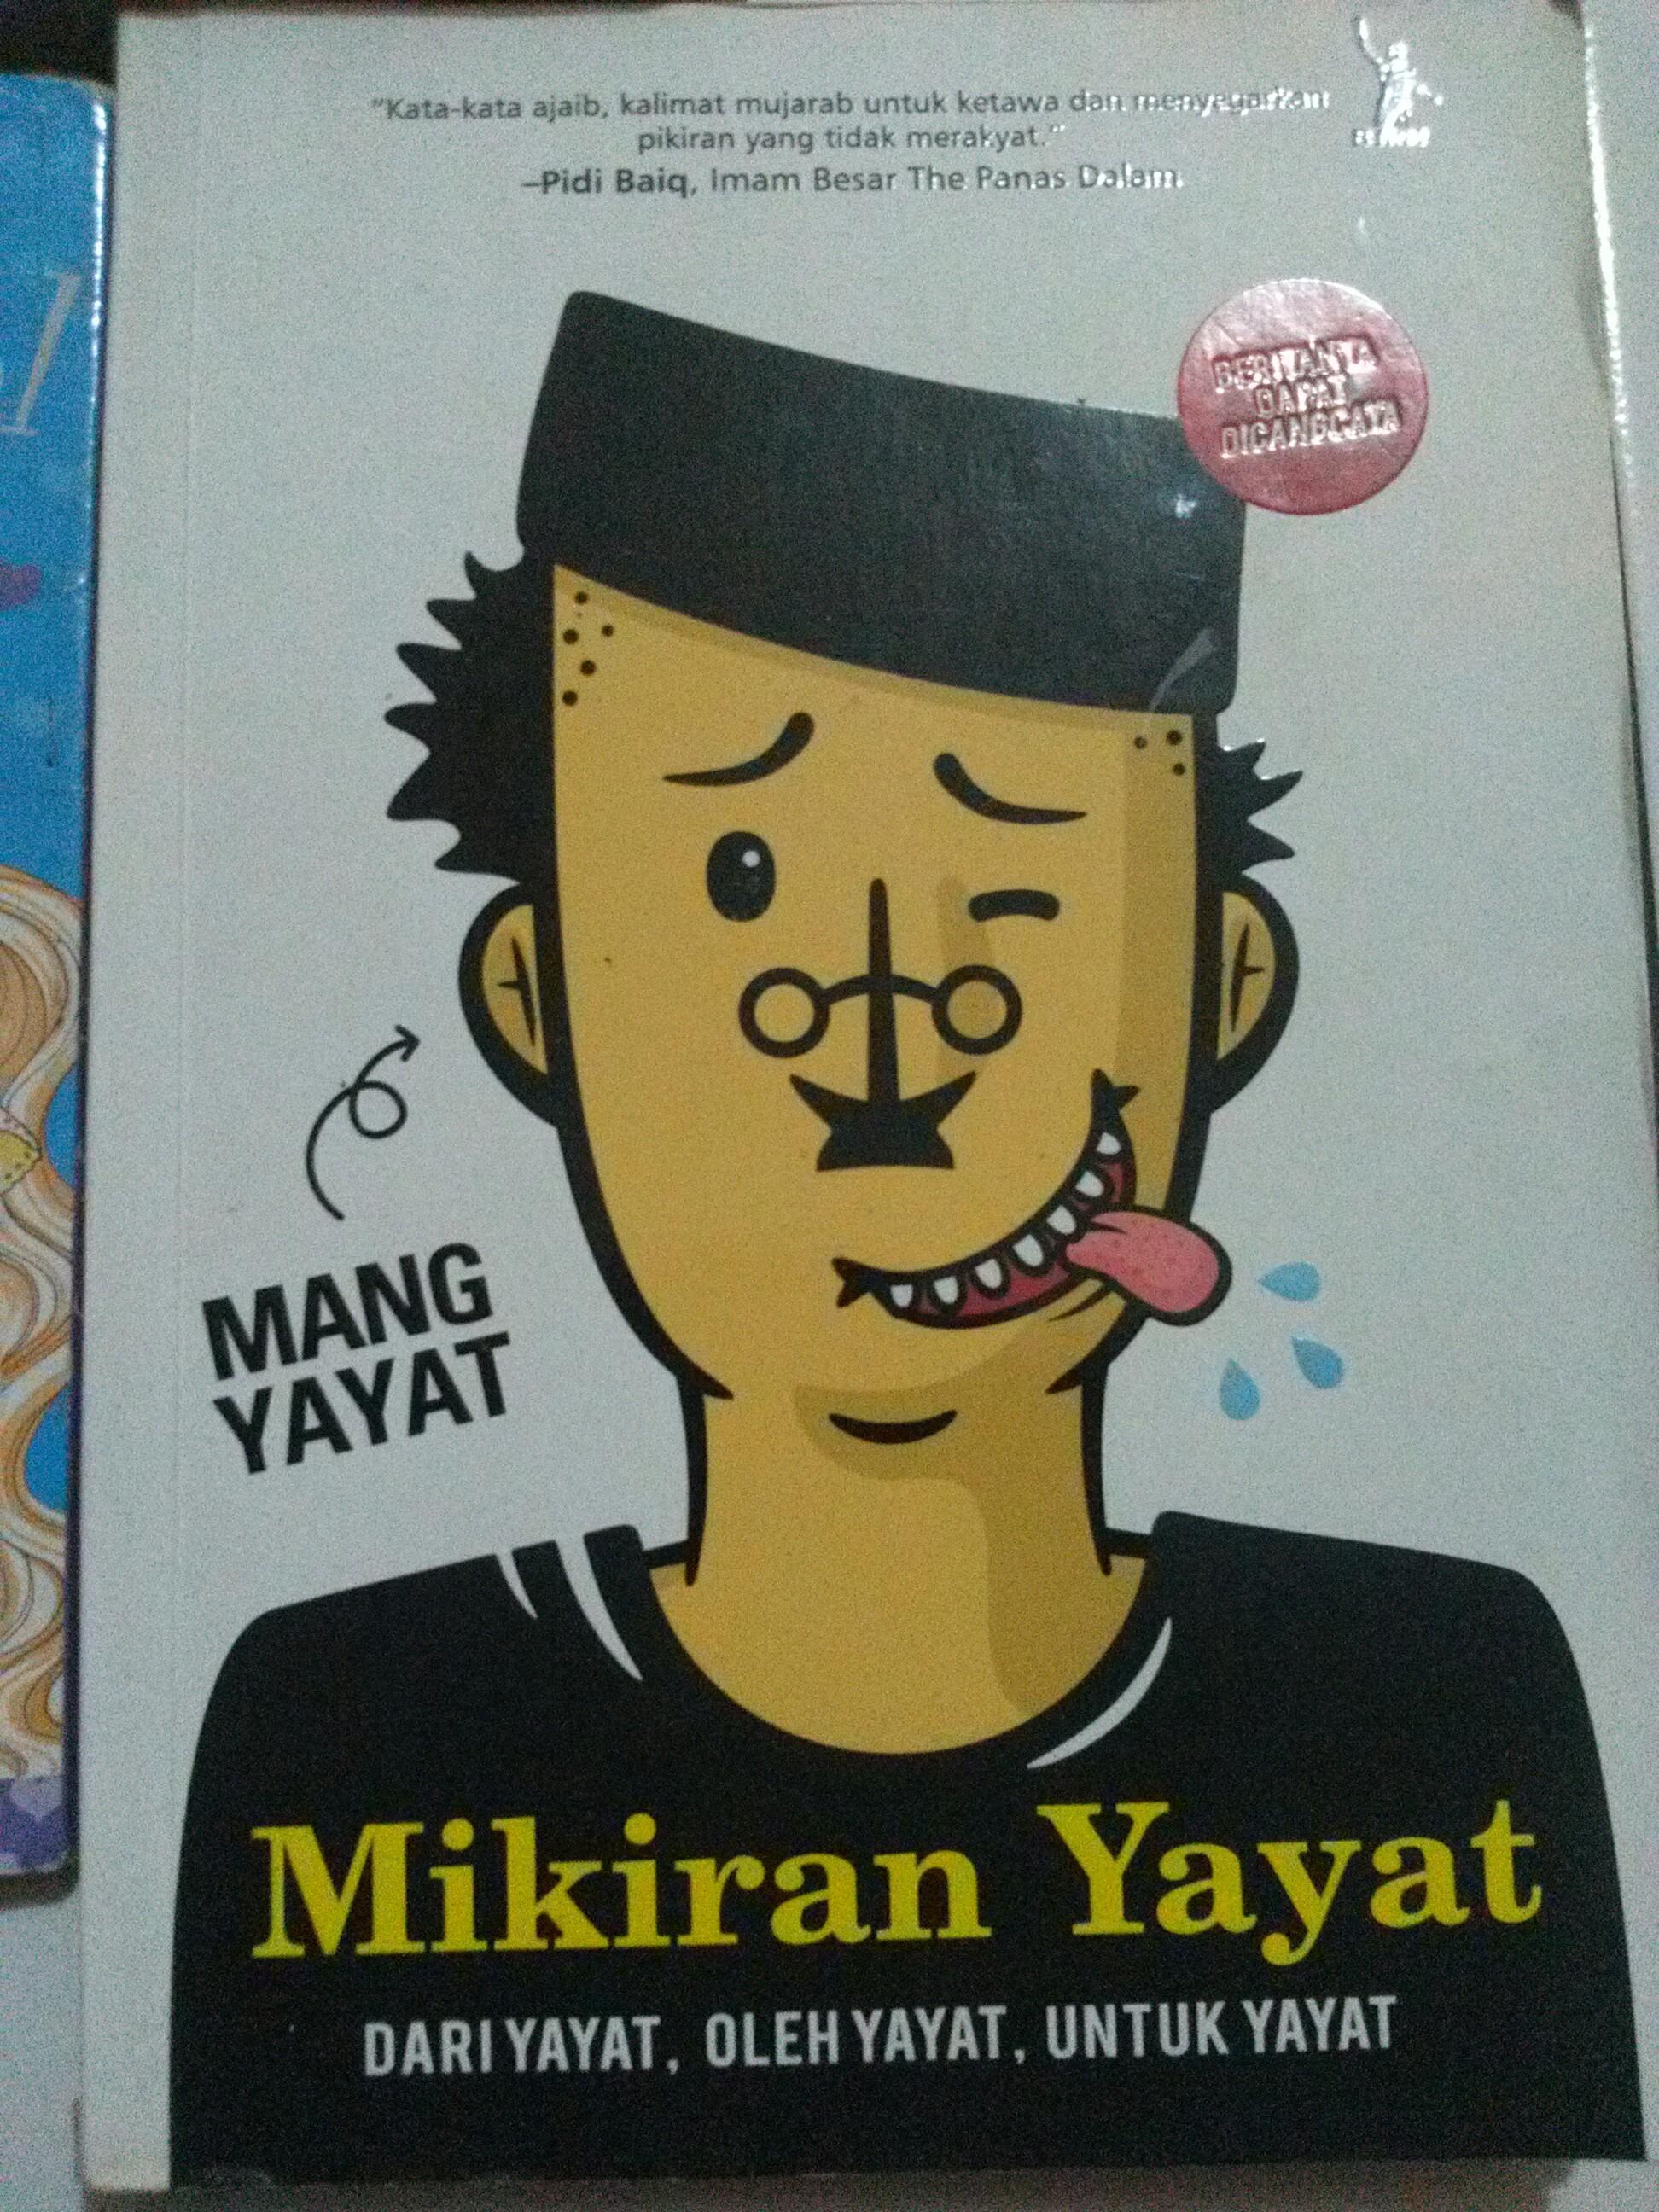 Komik, Novel, Humor